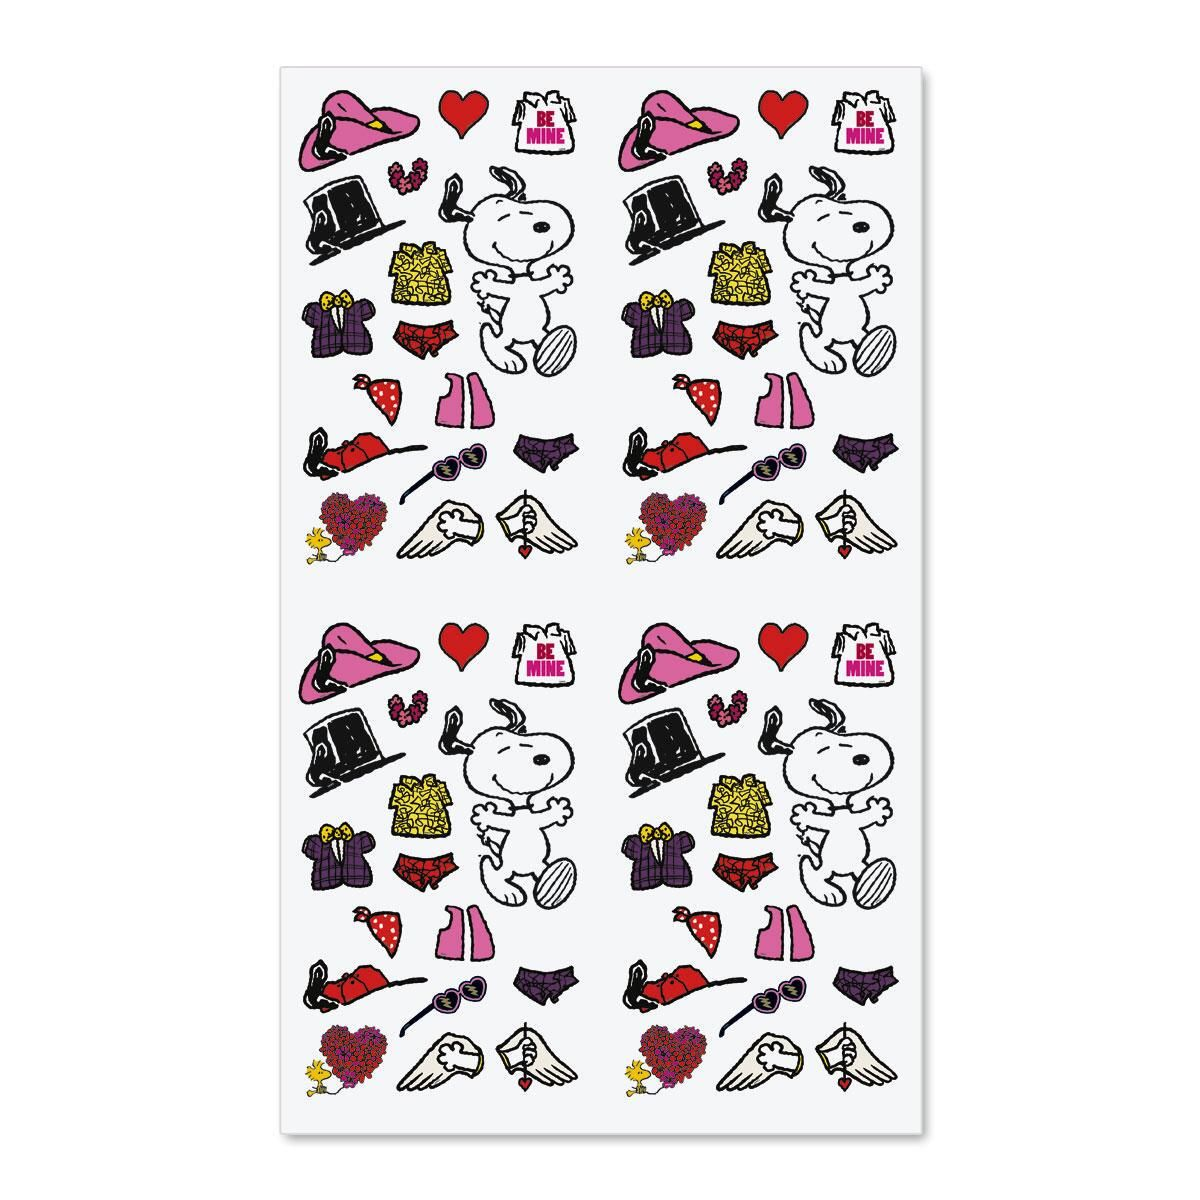 Snoopy™ Dress Up Sticker Sheets